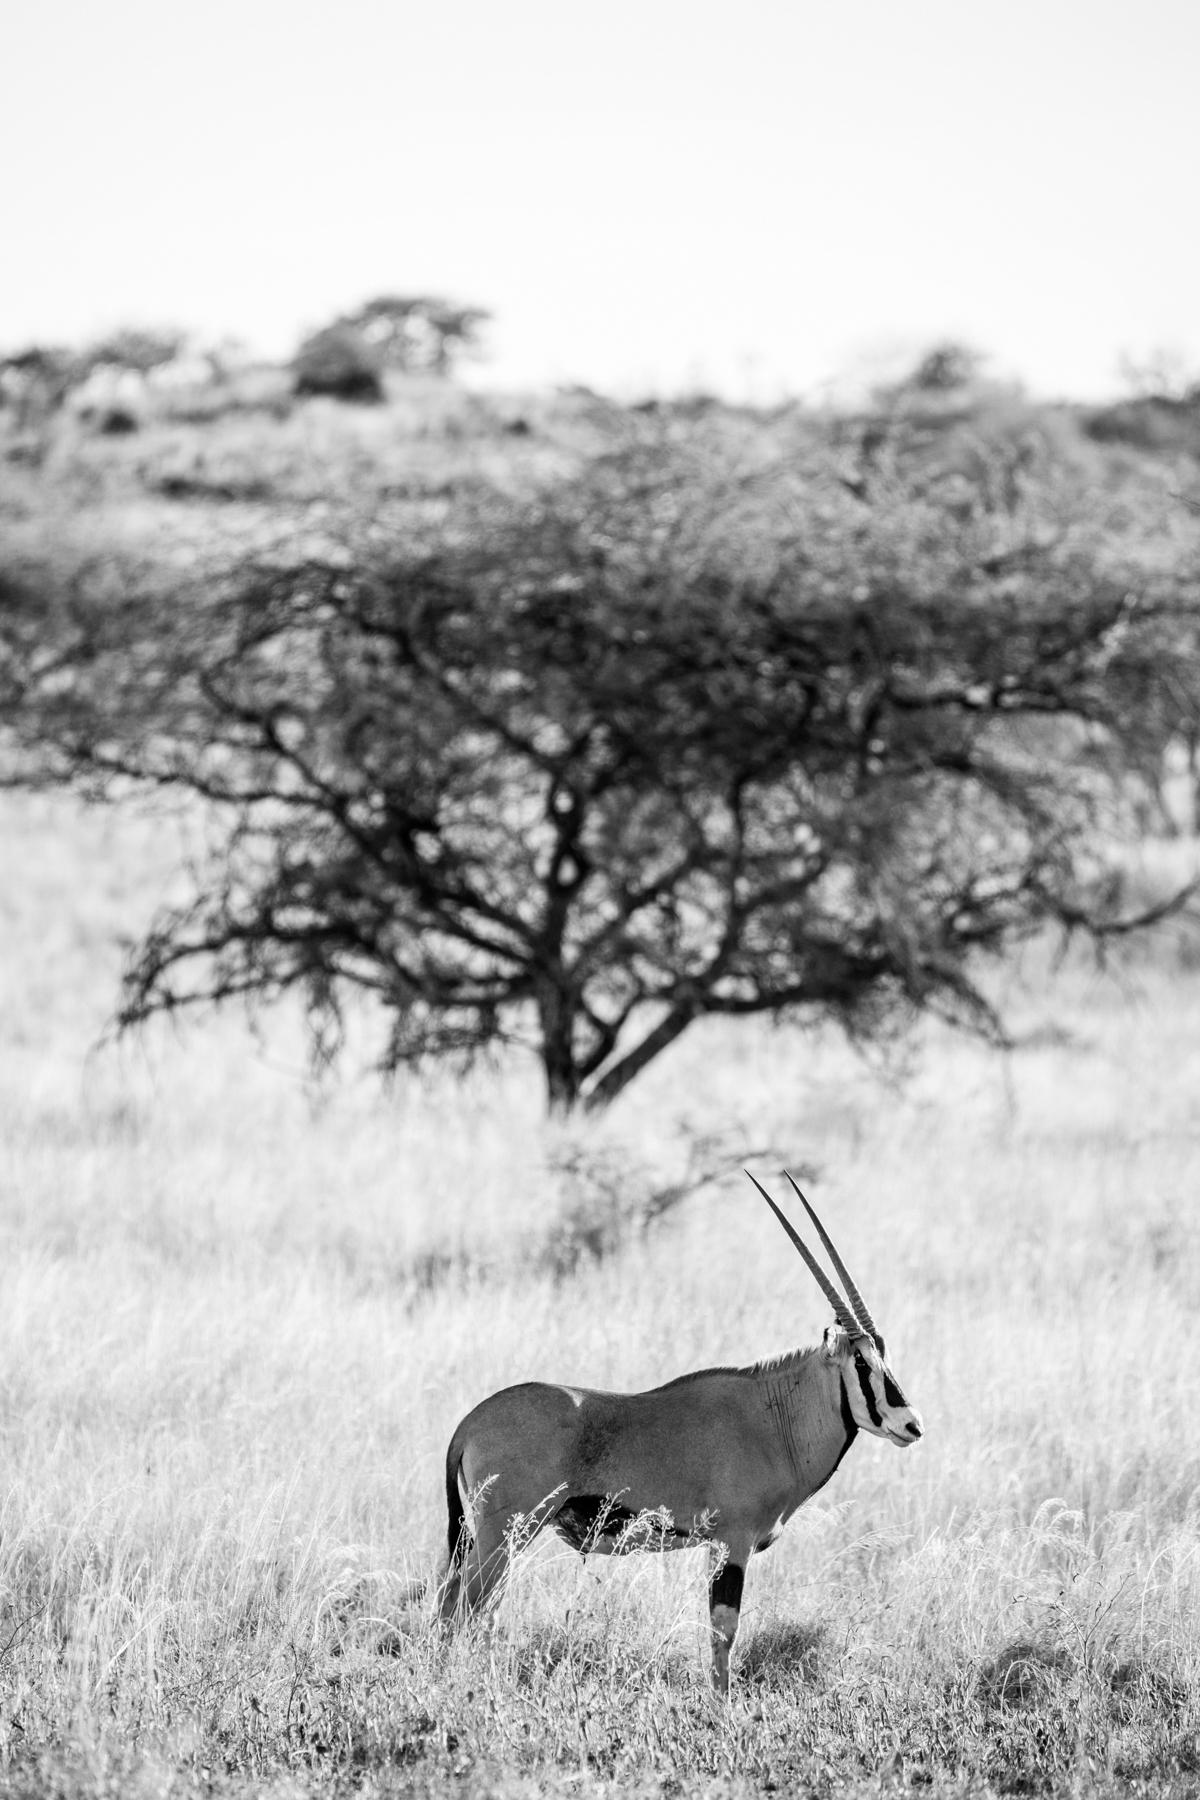 KenyaFeb2019_Safari-61.jpg